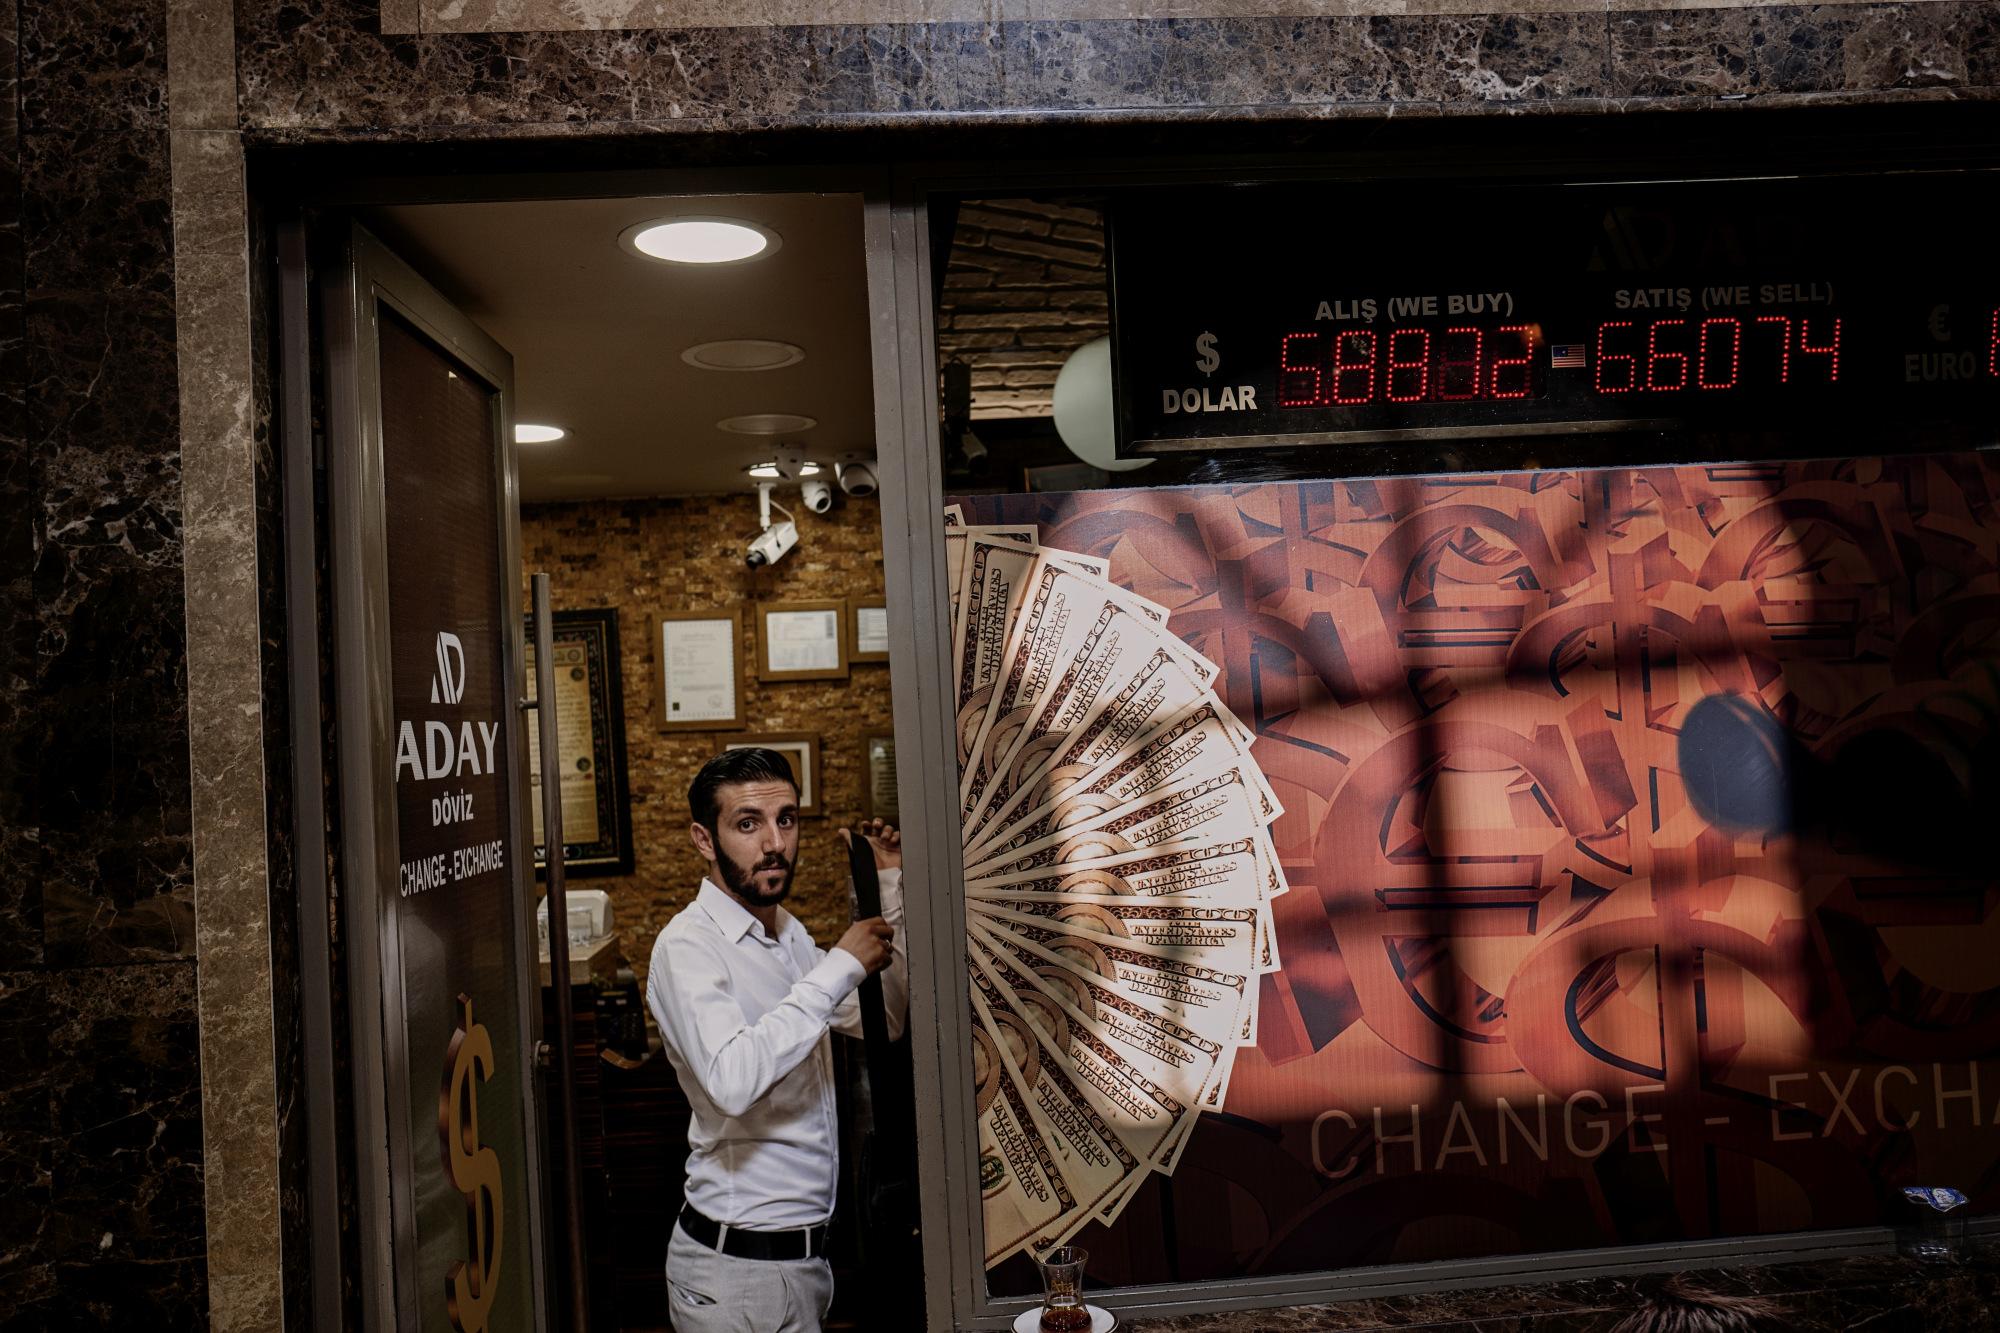 U.S. Stocks Turn Lower as Investors Assess Turkey: Markets Wrap